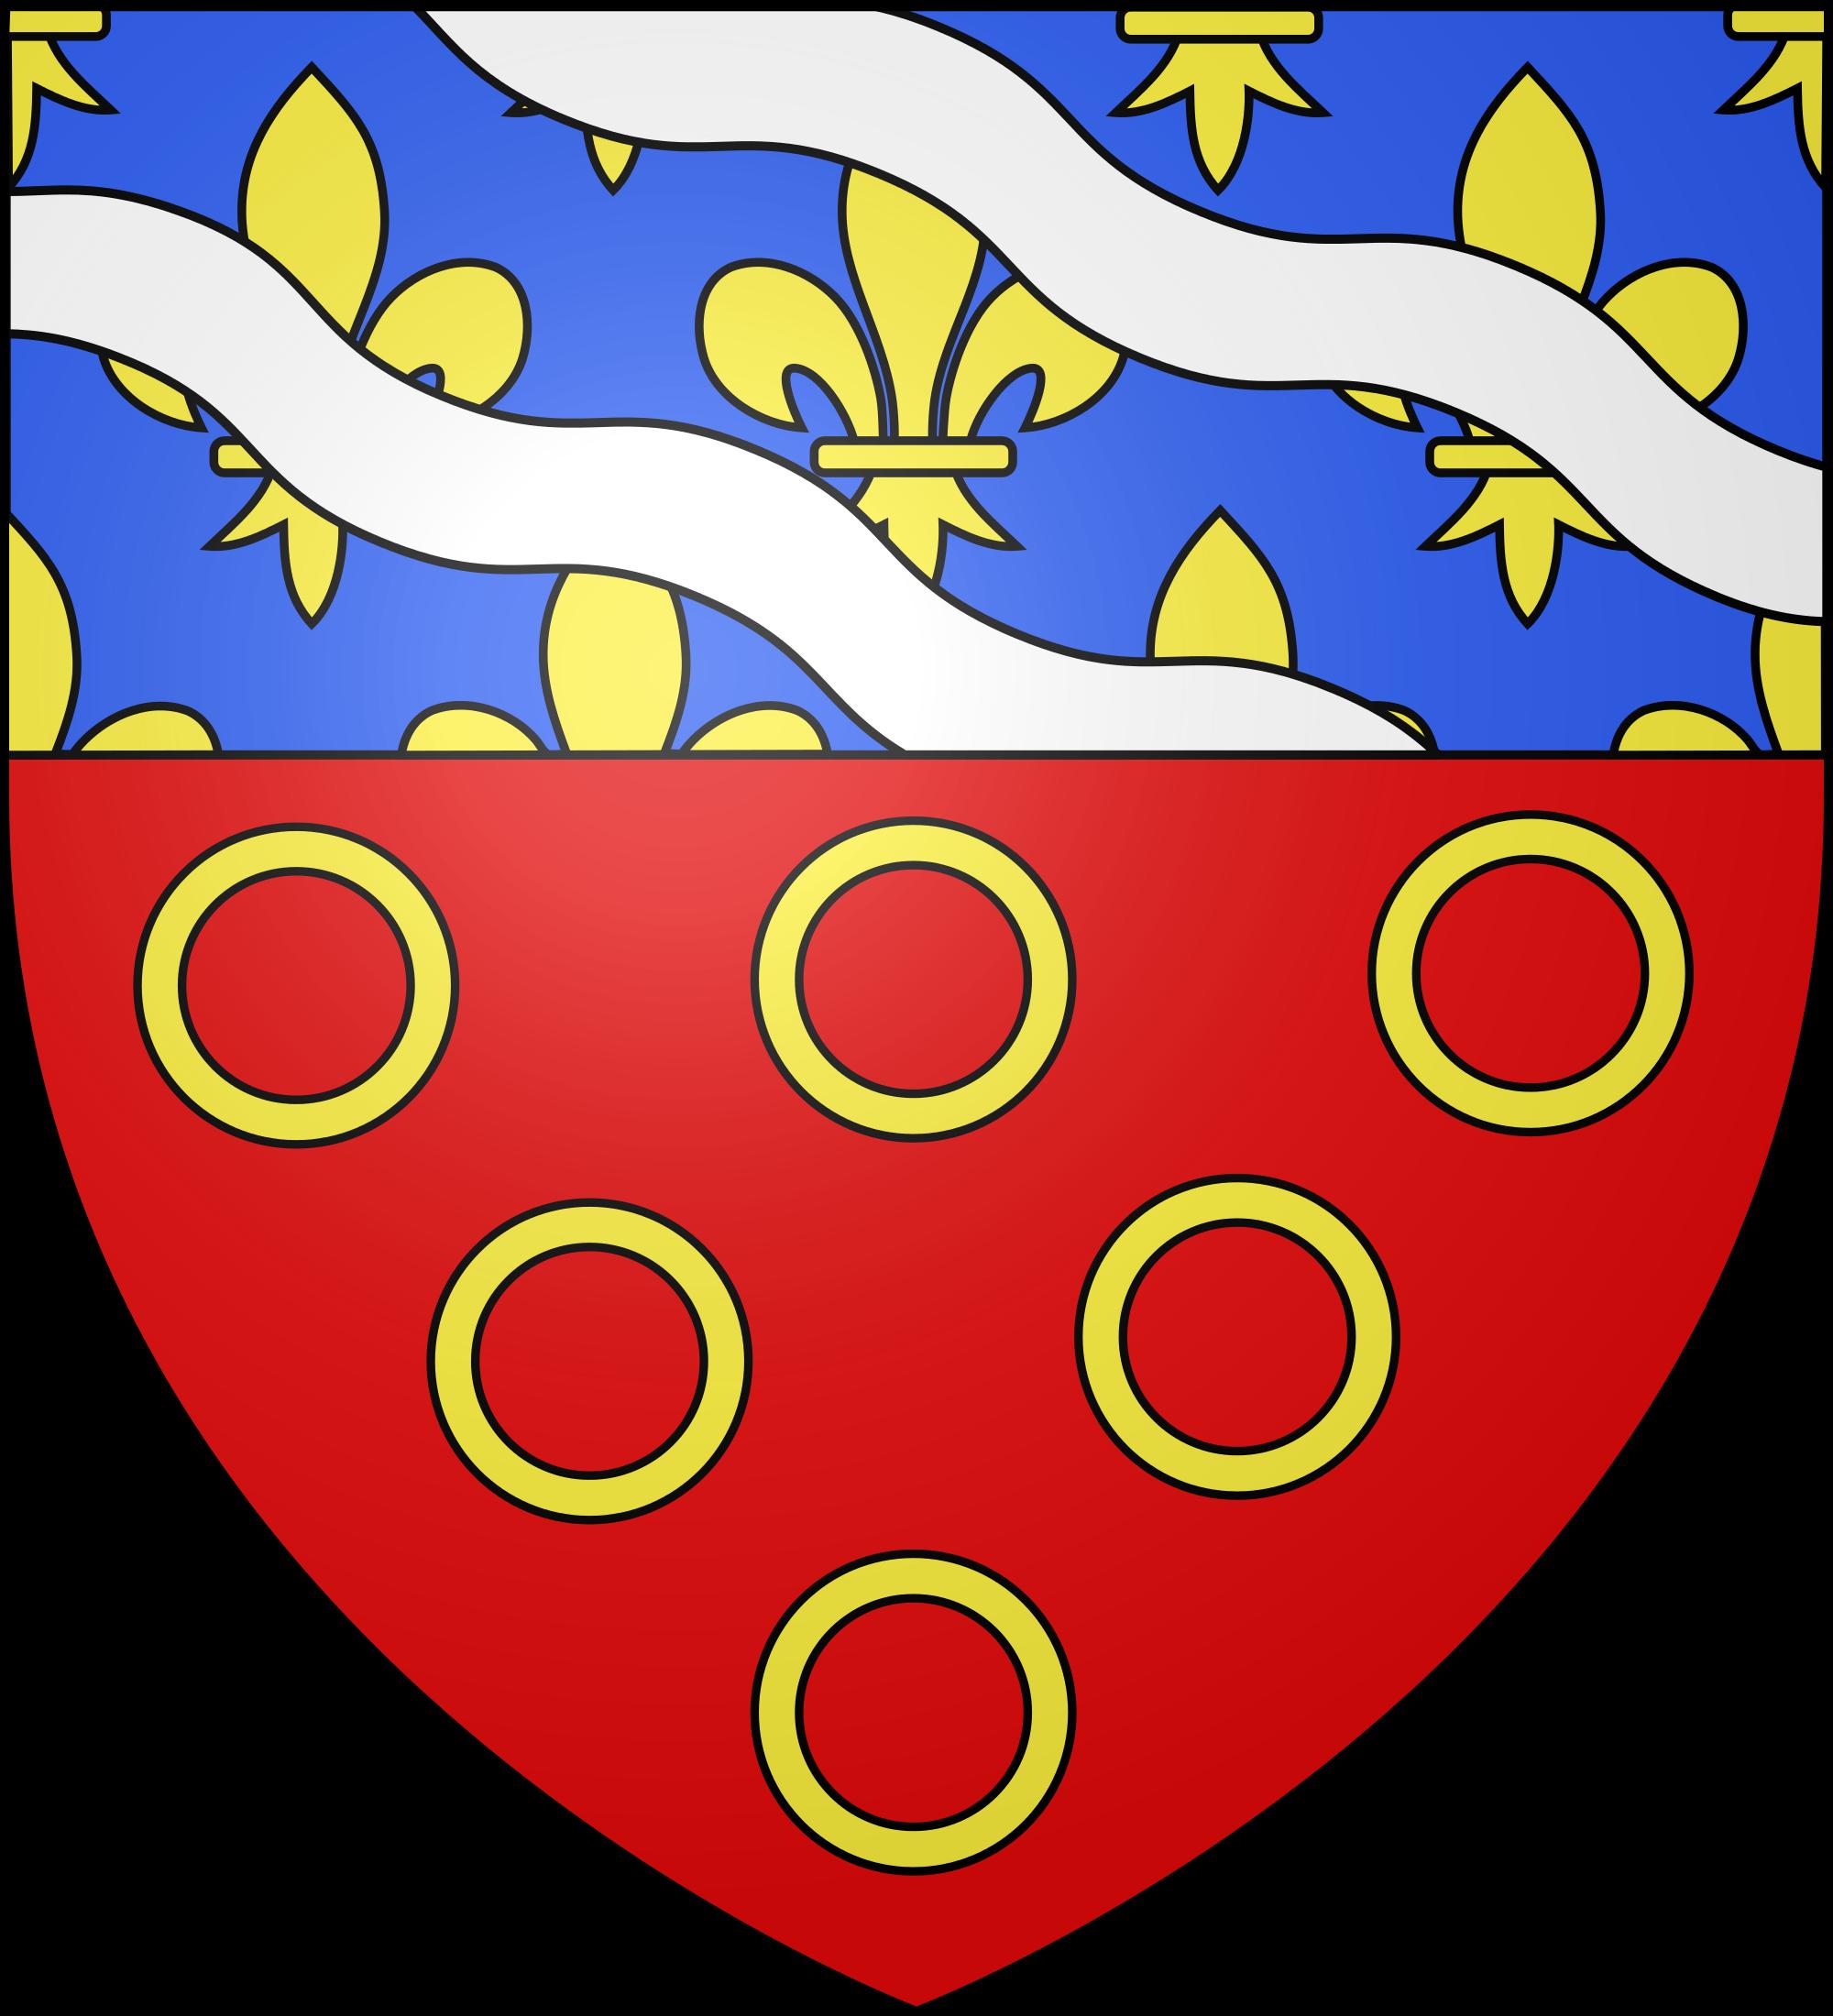 File:Blason ville fr Gazeran (Yvelines).svg.